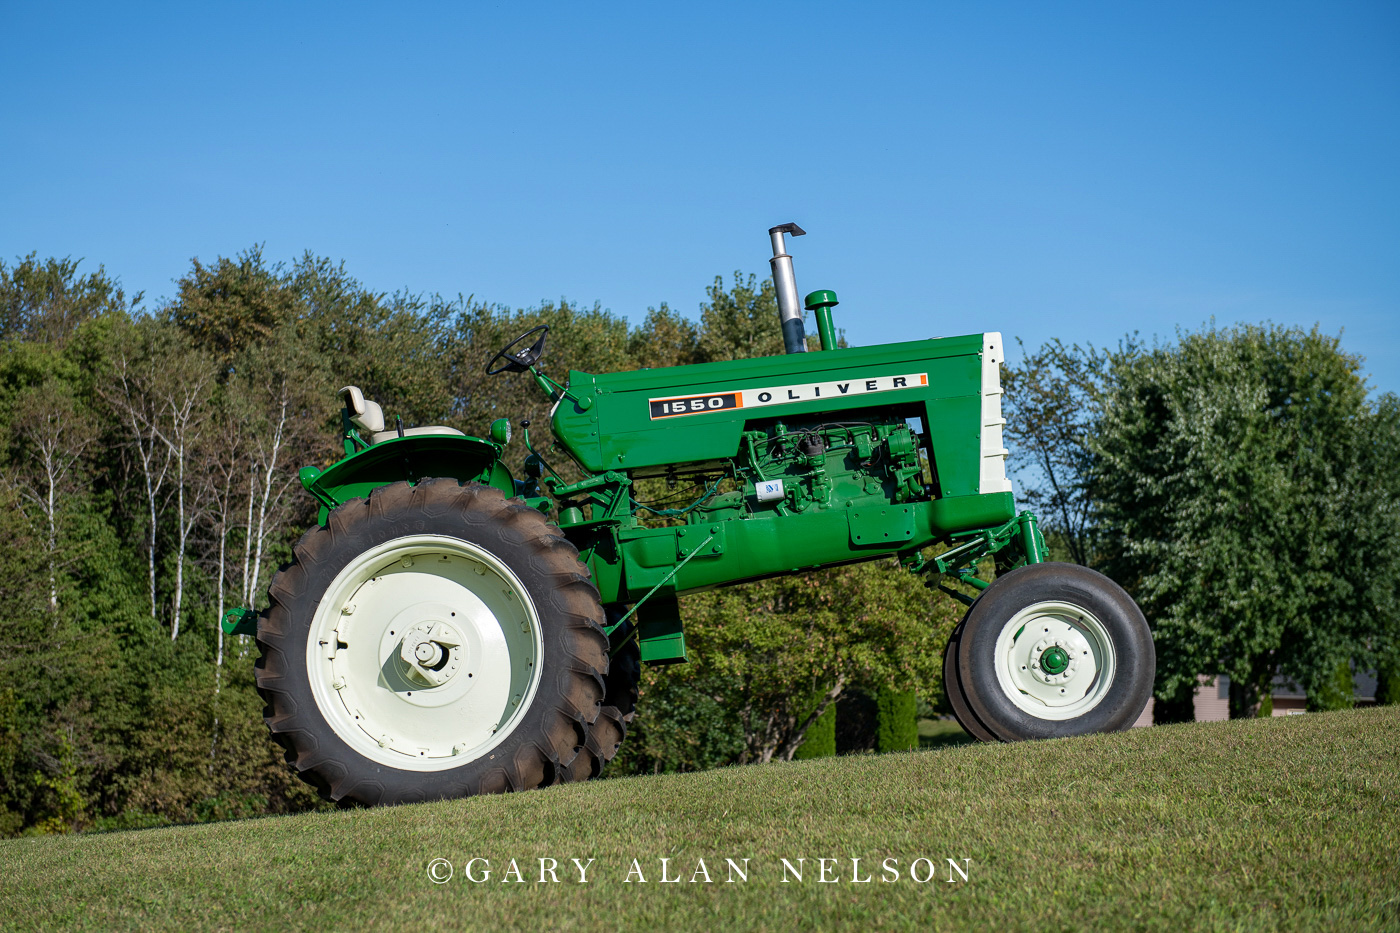 antique tractor, antique tractors, oliver, vintage tractors, photo